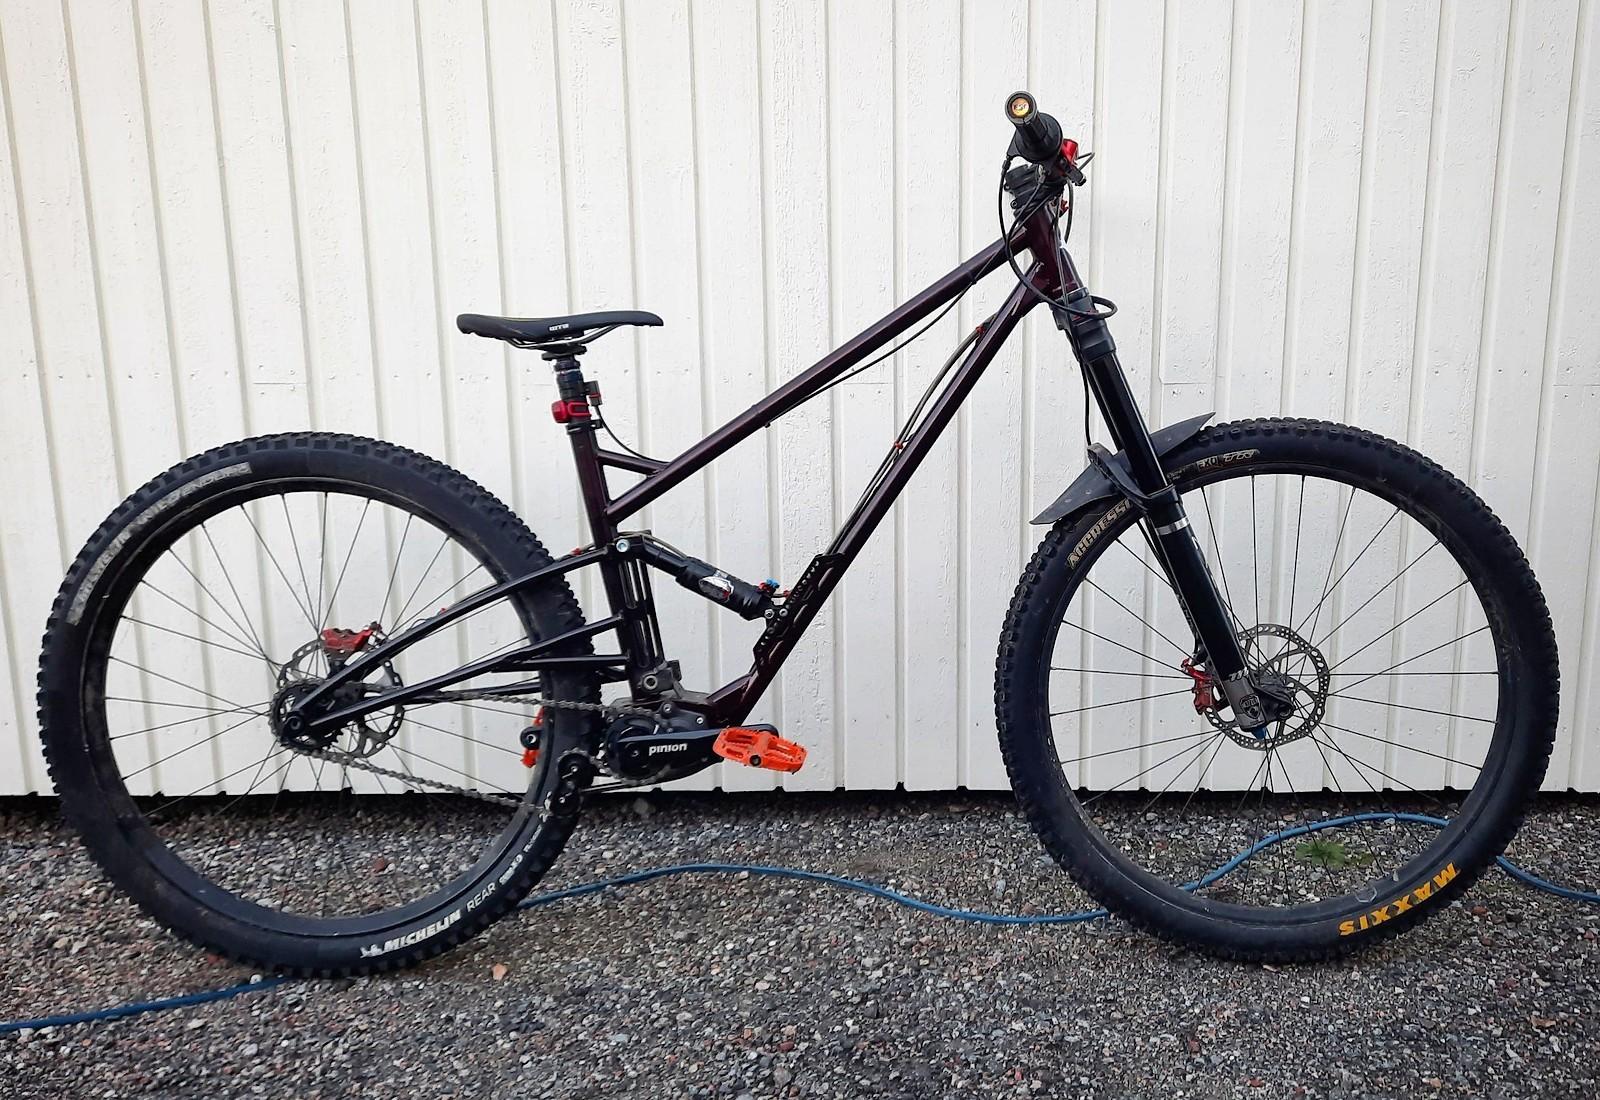 Dead Horse Pinion - Vital Bike of the Day December 2020 - Mountain Biking Pictures - Vital MTB